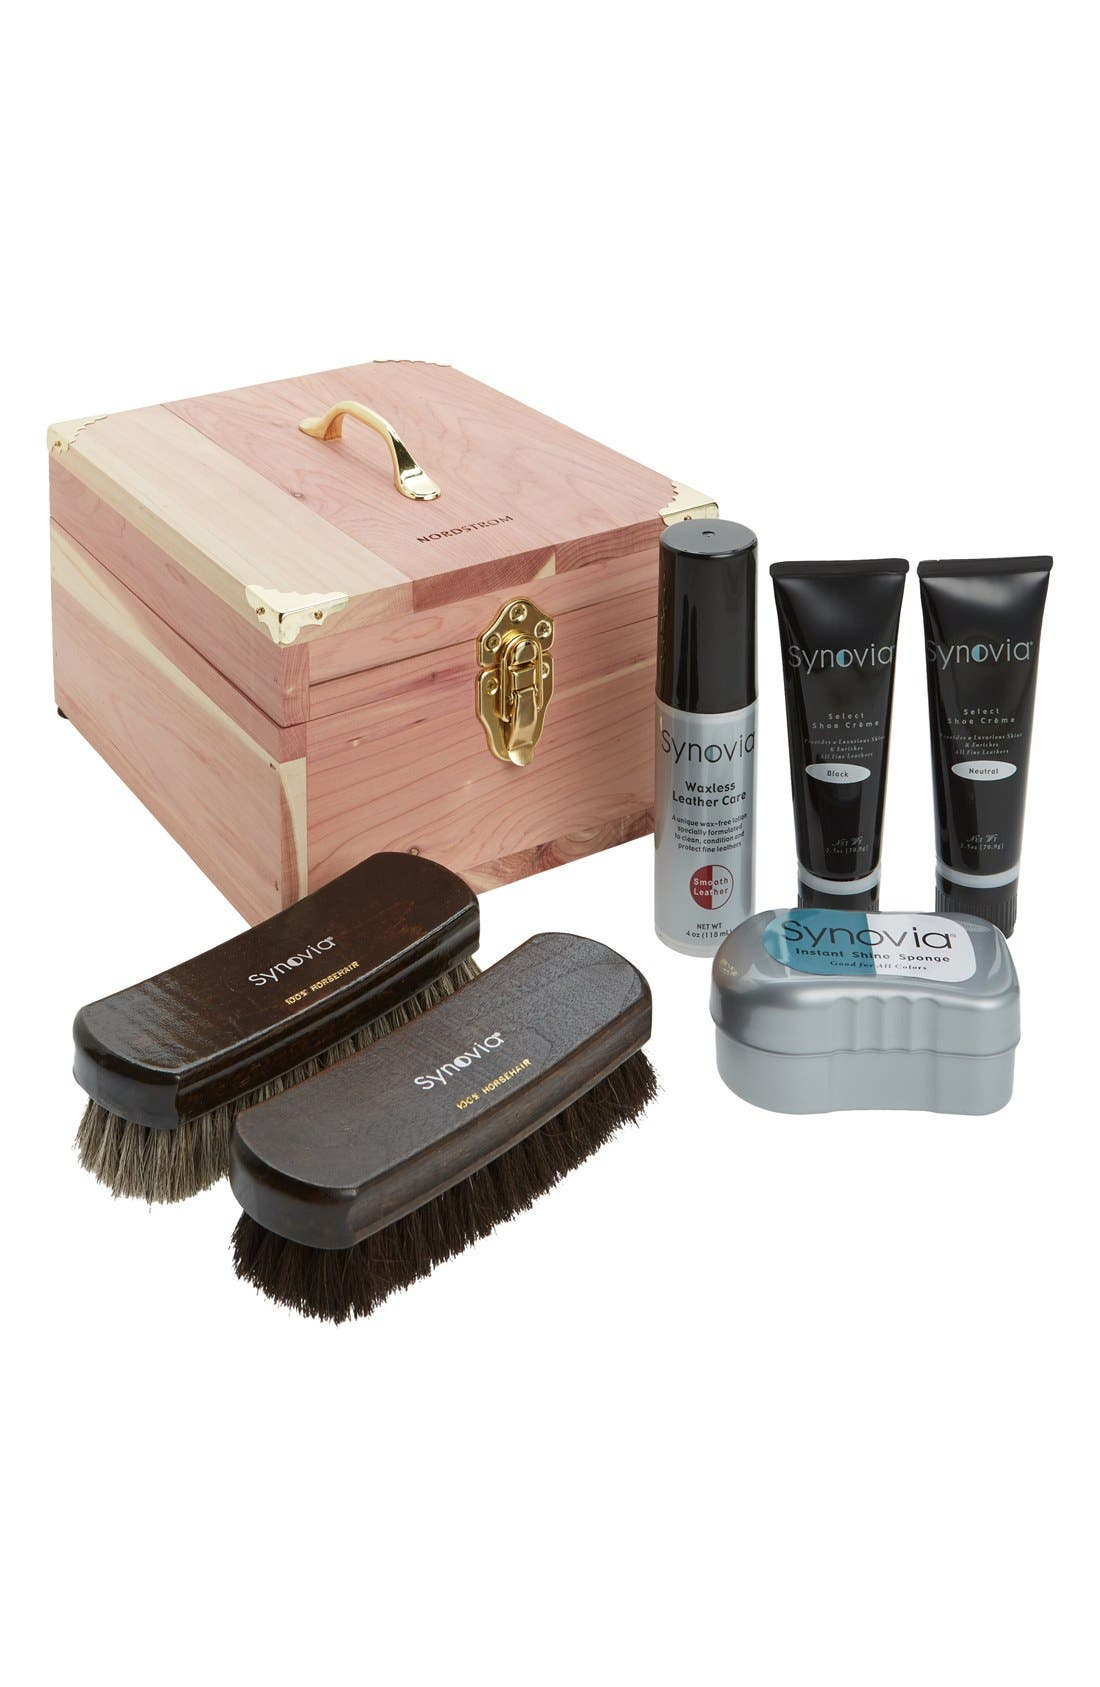 Alternate Image 1 Selected - Synovia Shoe Care Kit & Deluxe Cedar Box